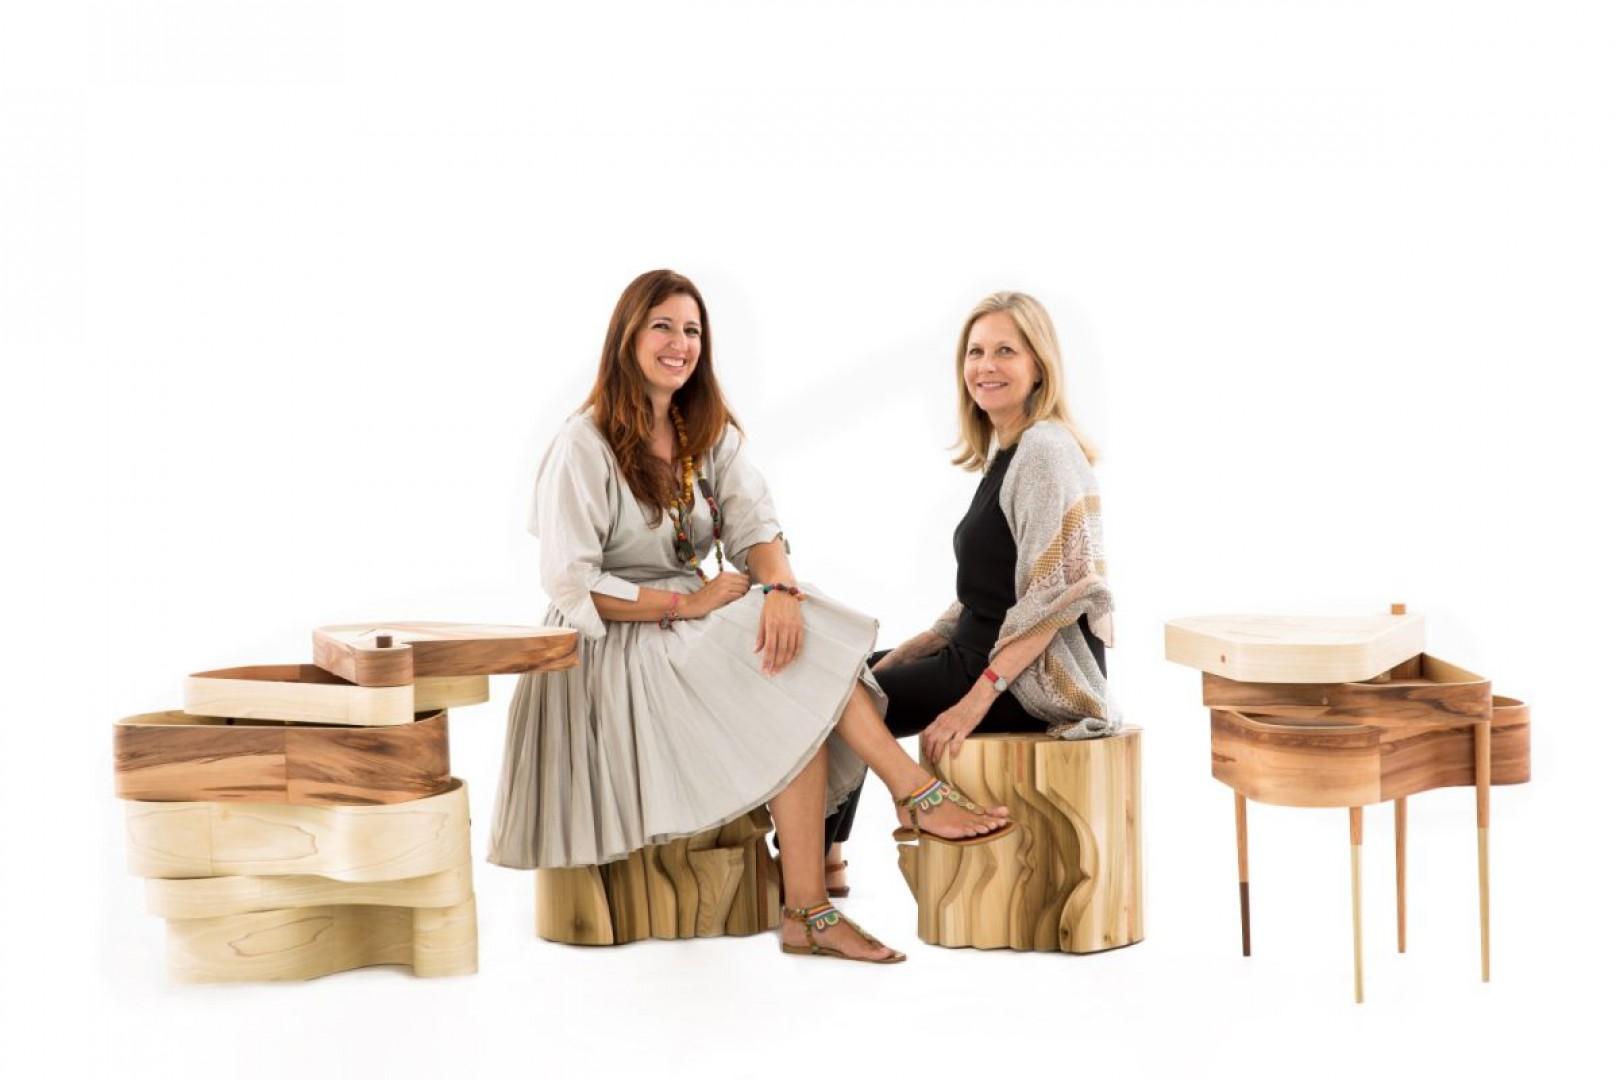 Family of tables. Projekt: Benedetta Tagliabue (Miralles Tagliabue EMBT). Zamawiająca: Martha Thorne. Fot. Uxío Da Vila